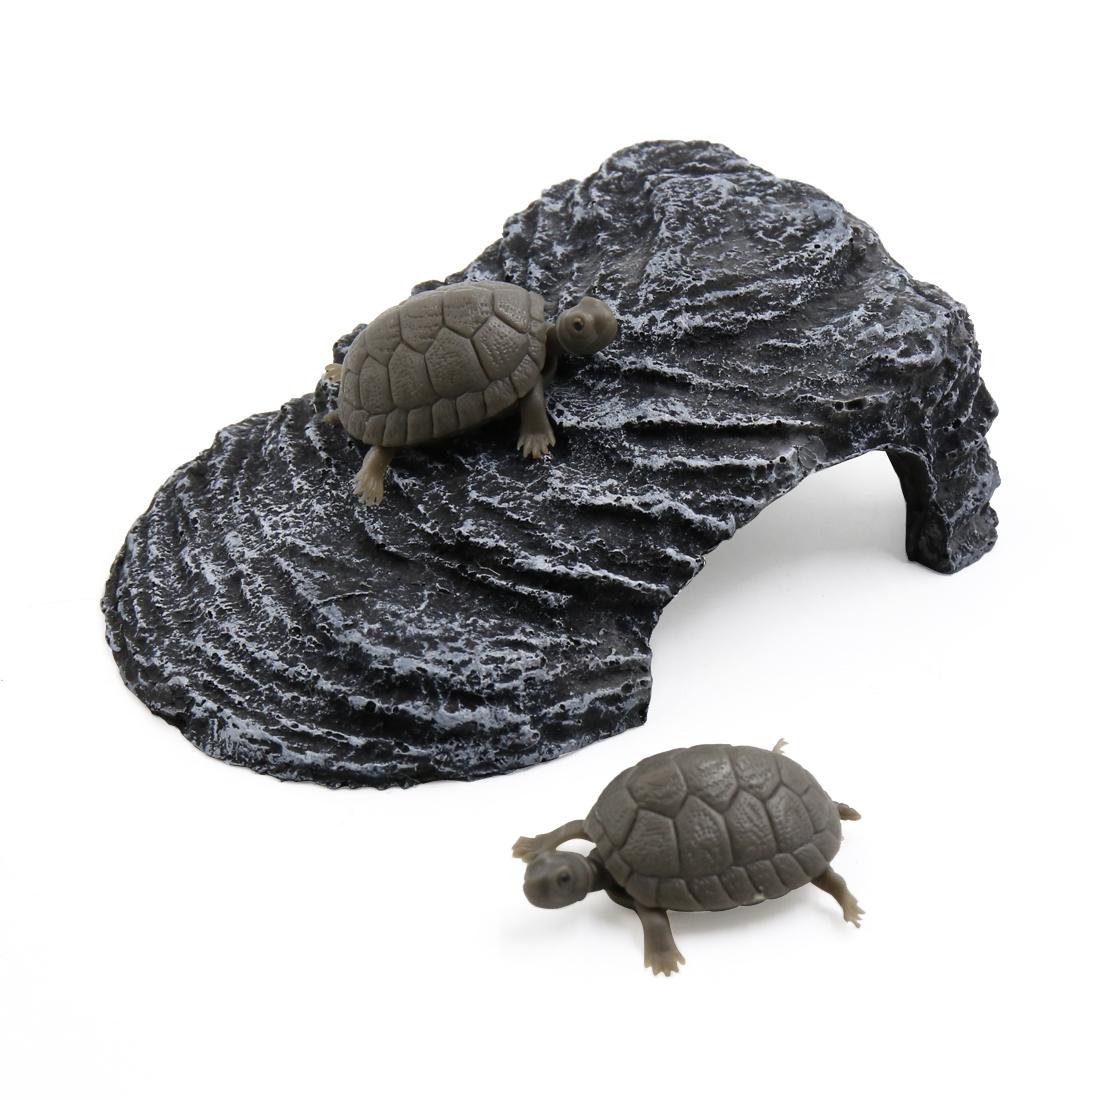 Dark Gray Landscape Resin Basking Ramp Turtle Climb Stone Habitat for Fish Tank